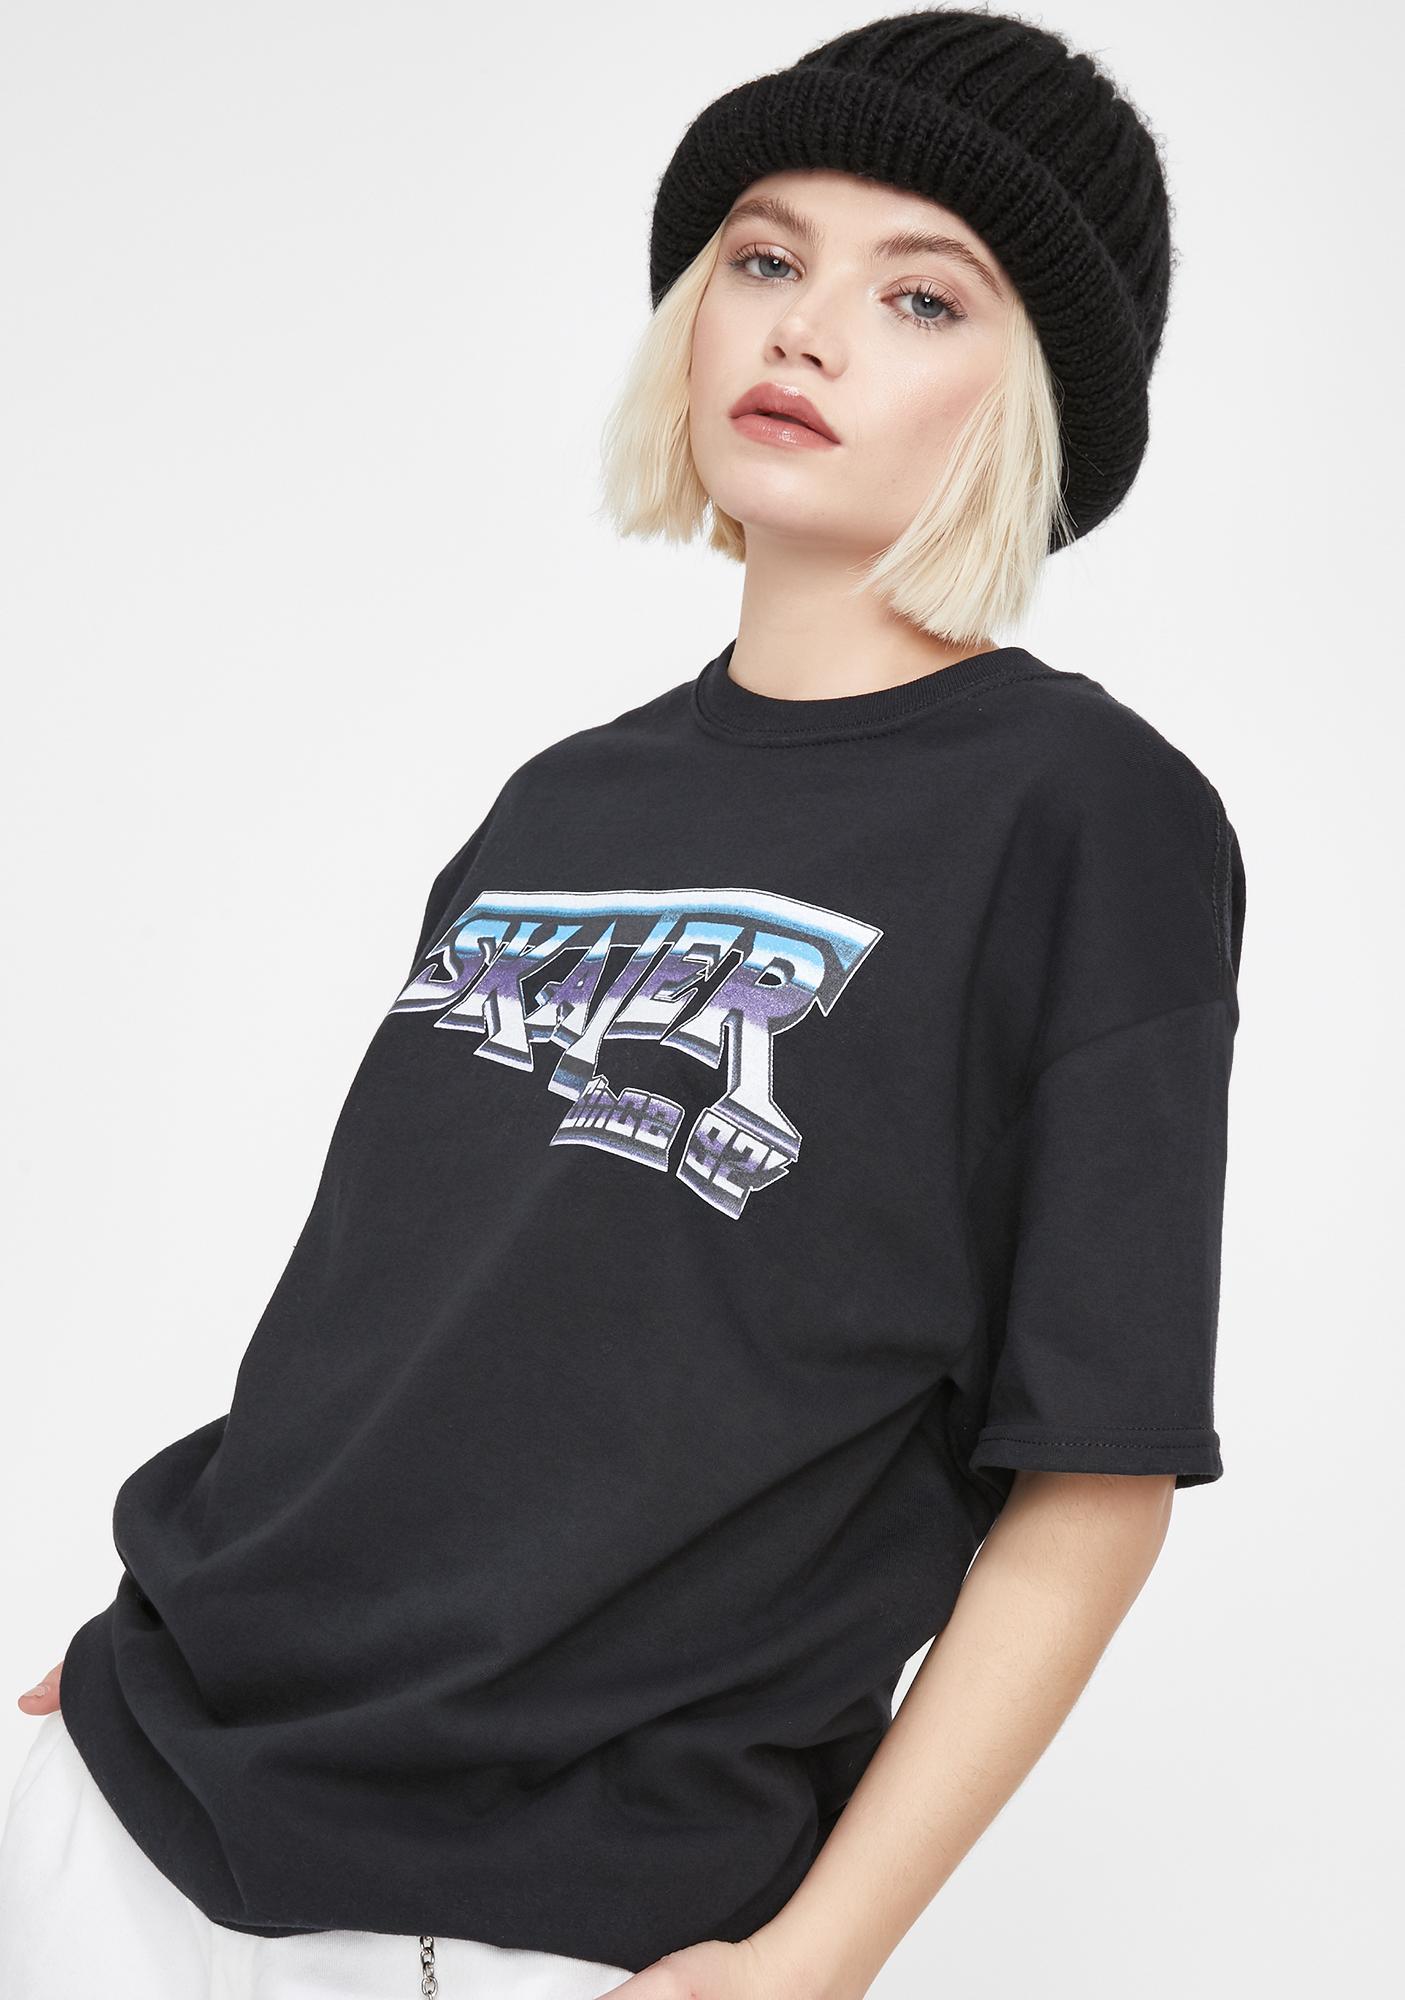 Daisy Street Skater '92 Graphic Tee